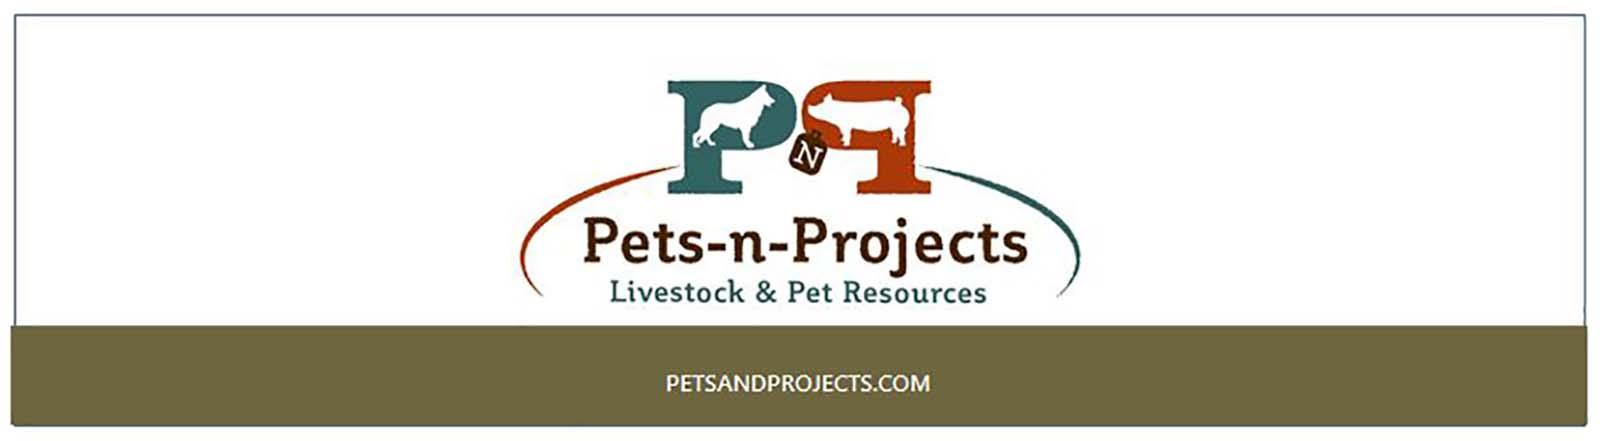 Petsandprojects Header - Brown1600